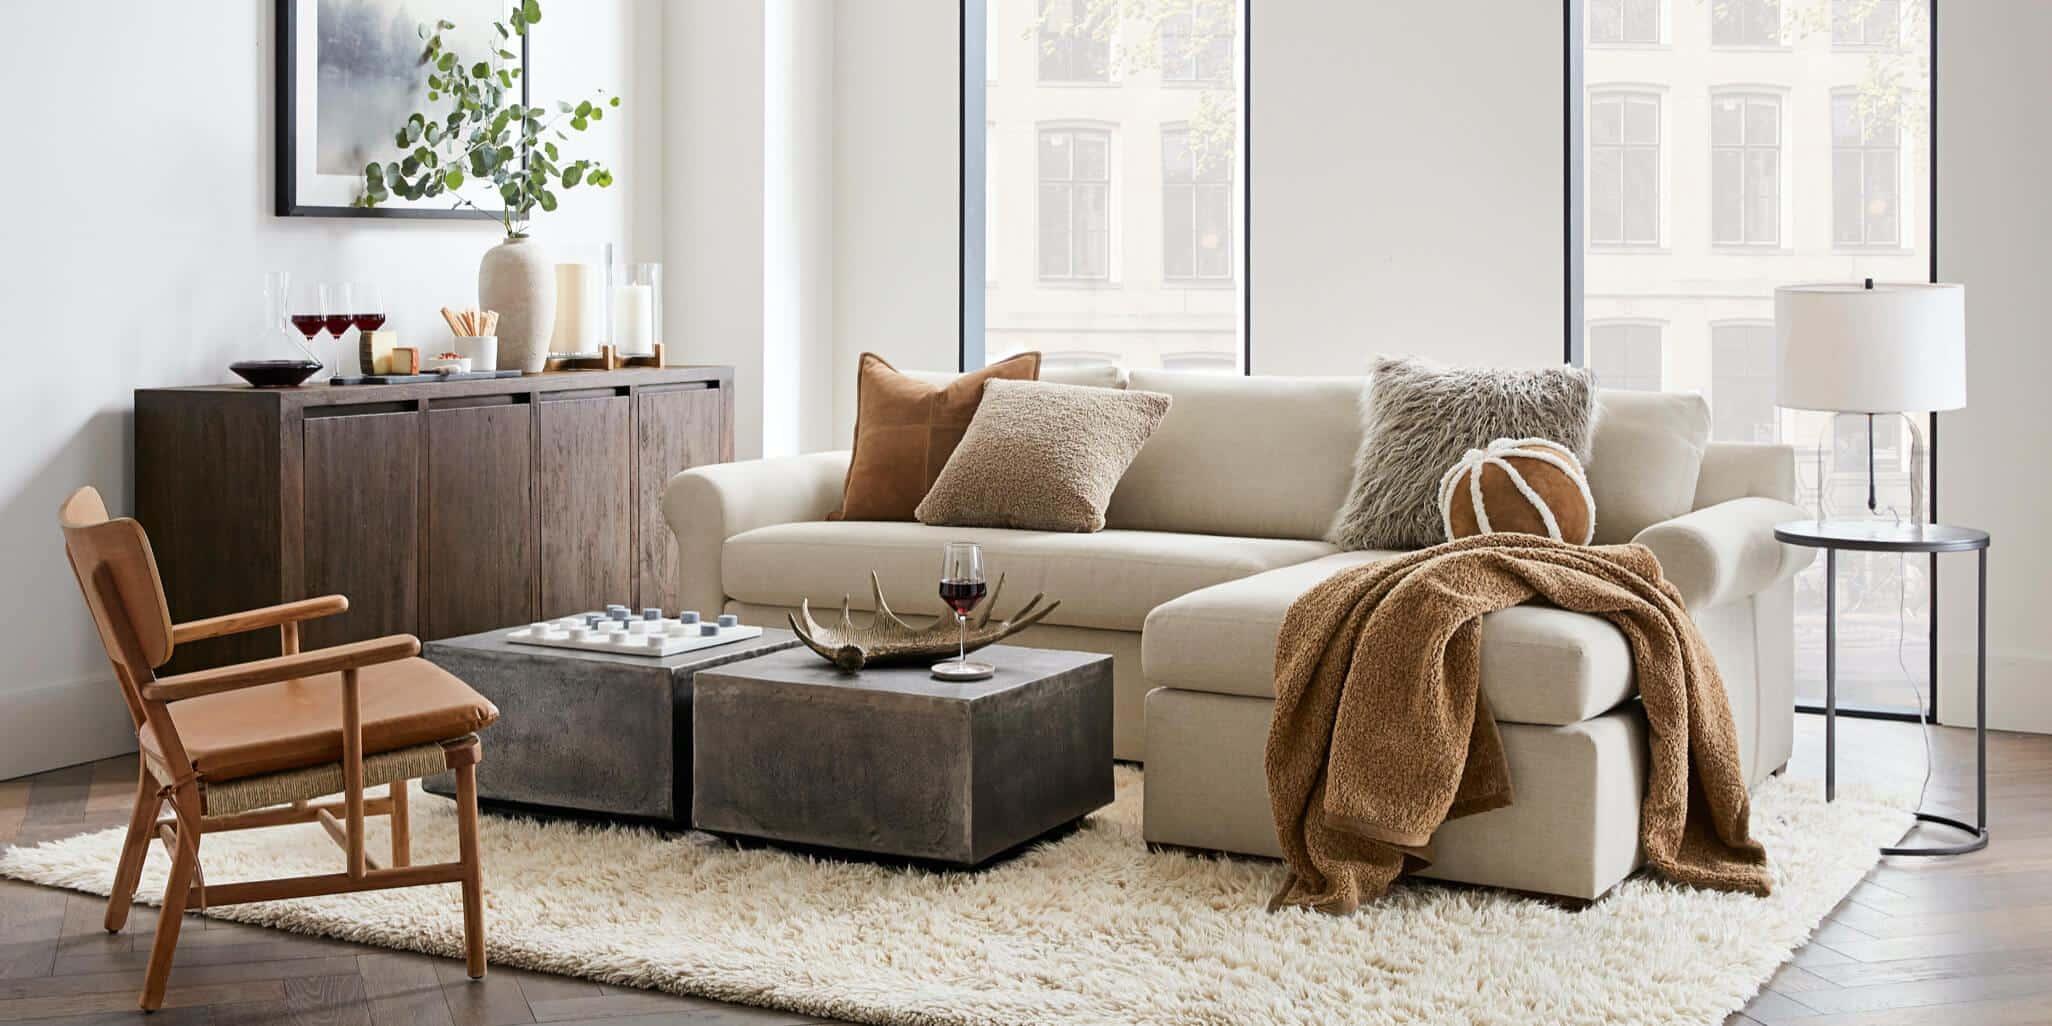 Shop Furniture Online | Pottery Barn Saudi Arabia